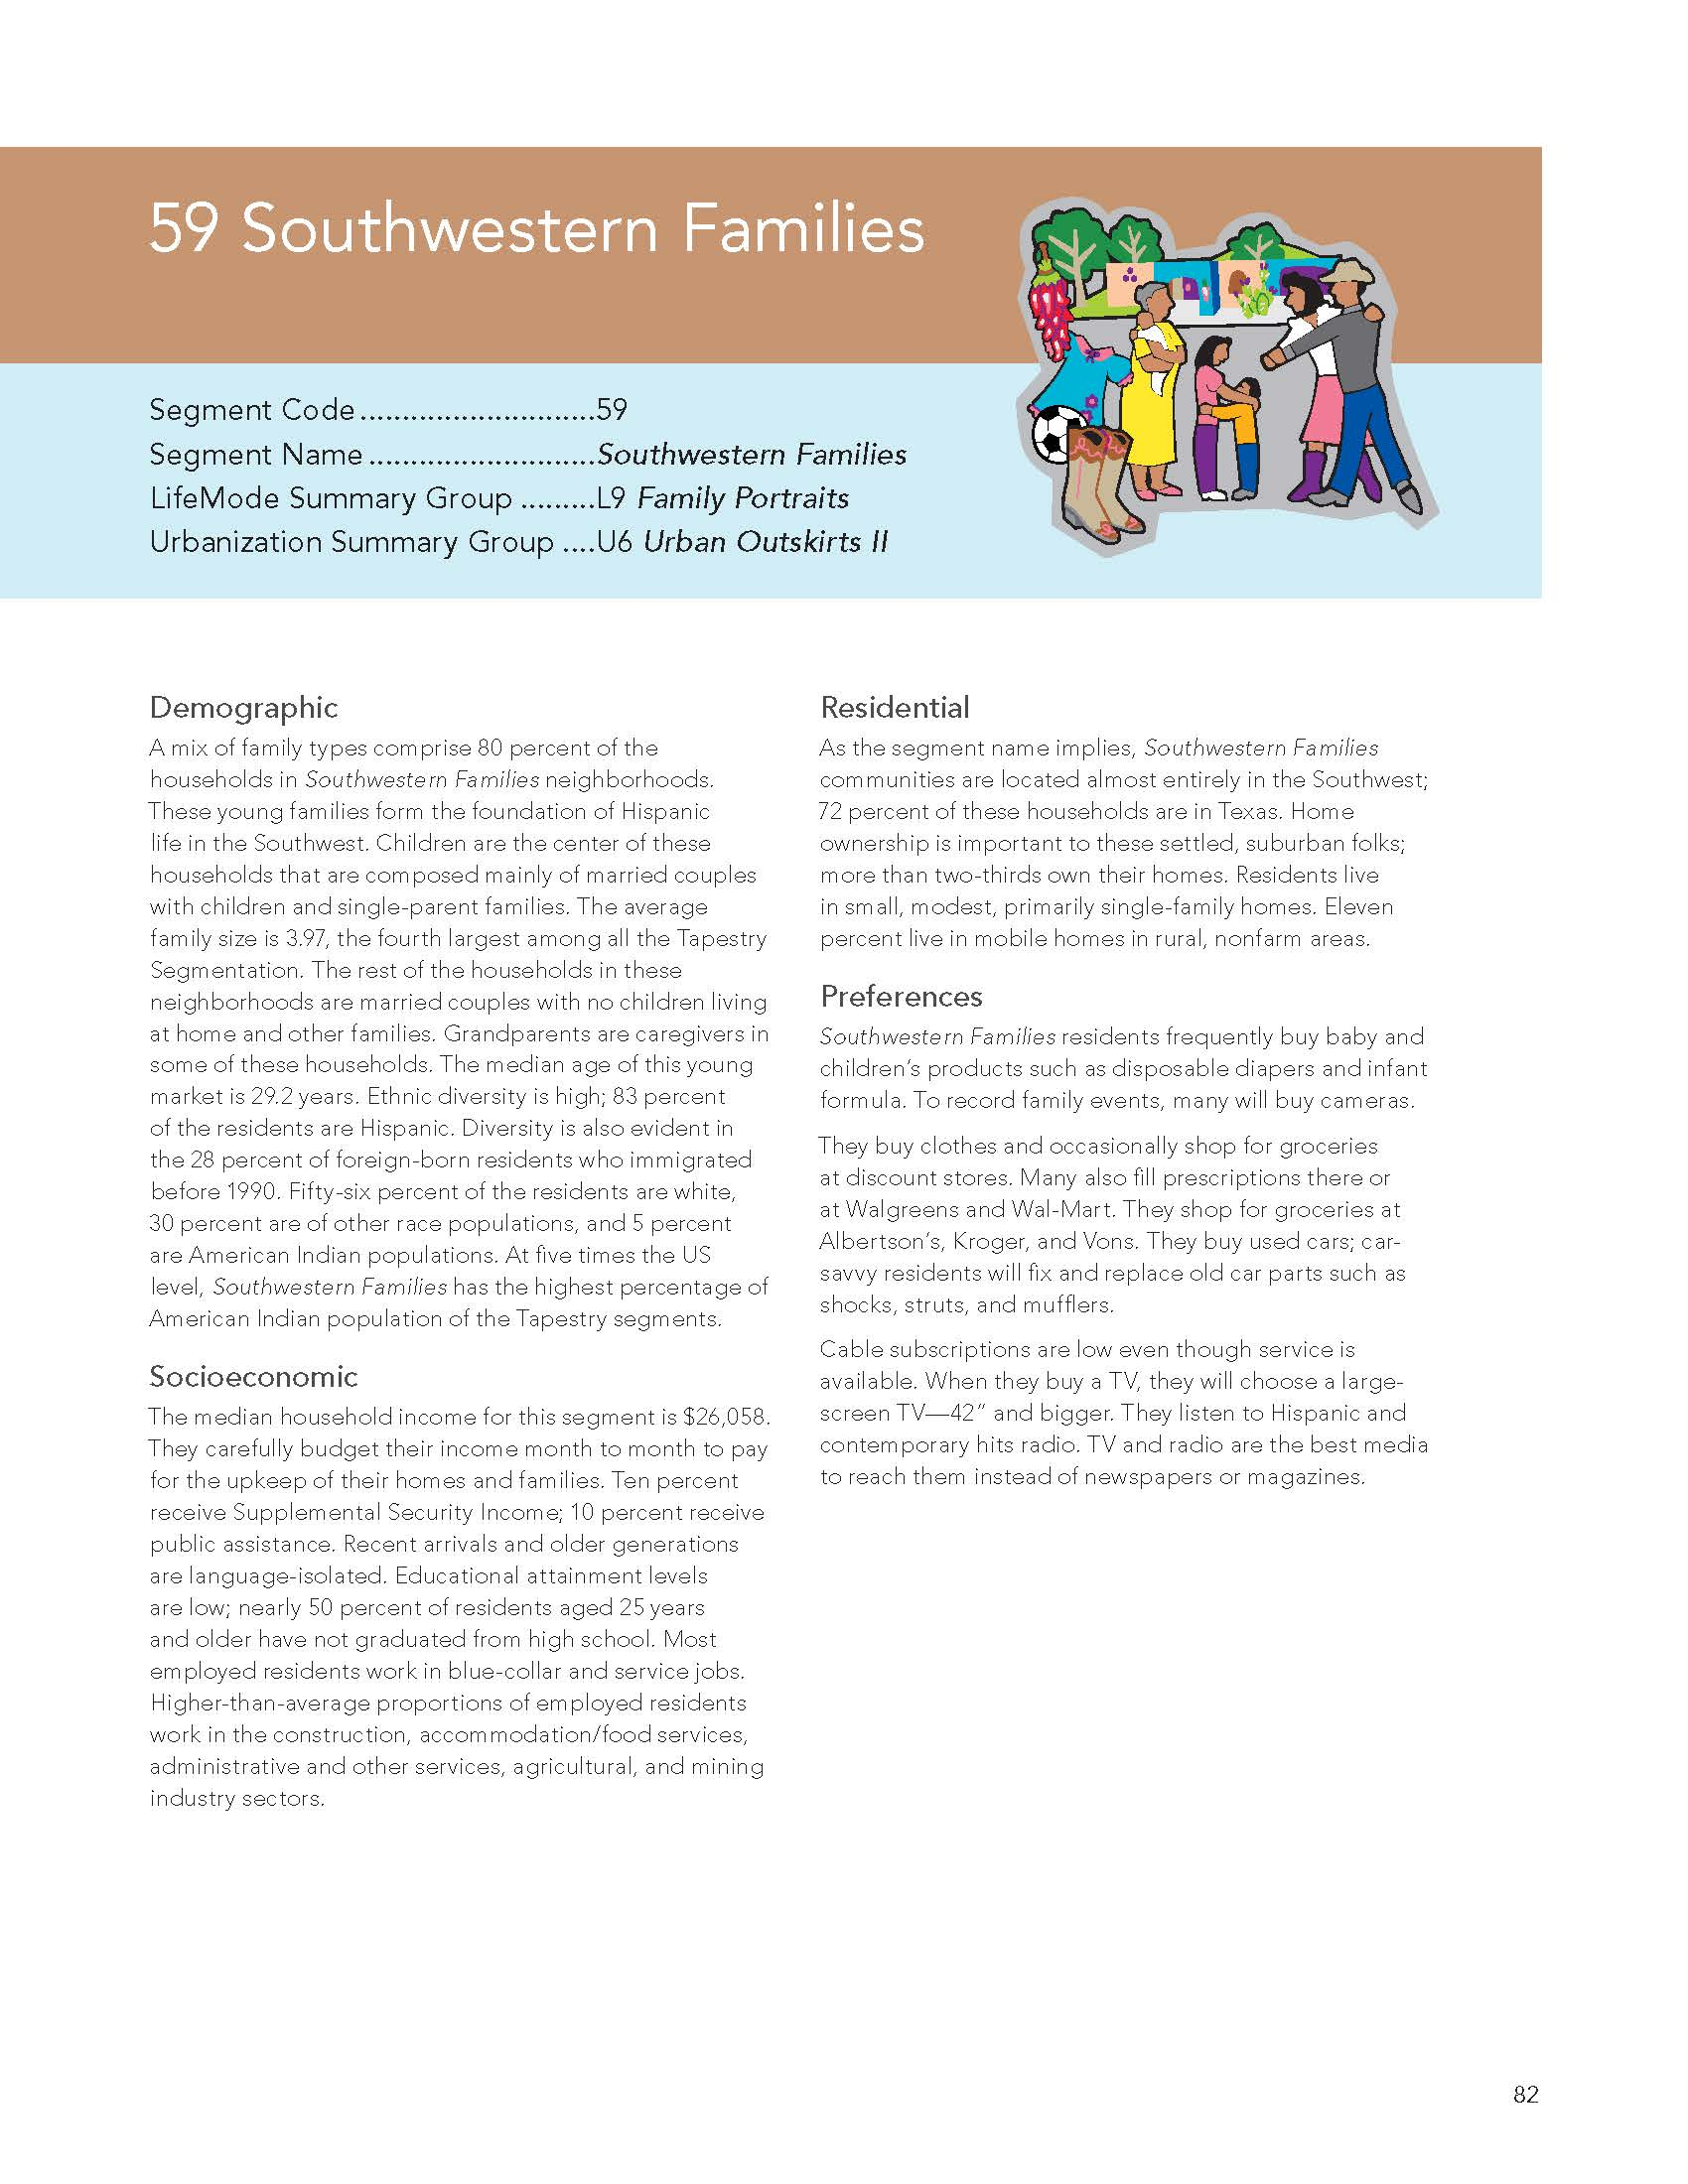 tapestry-segmentation_Page_85.jpg